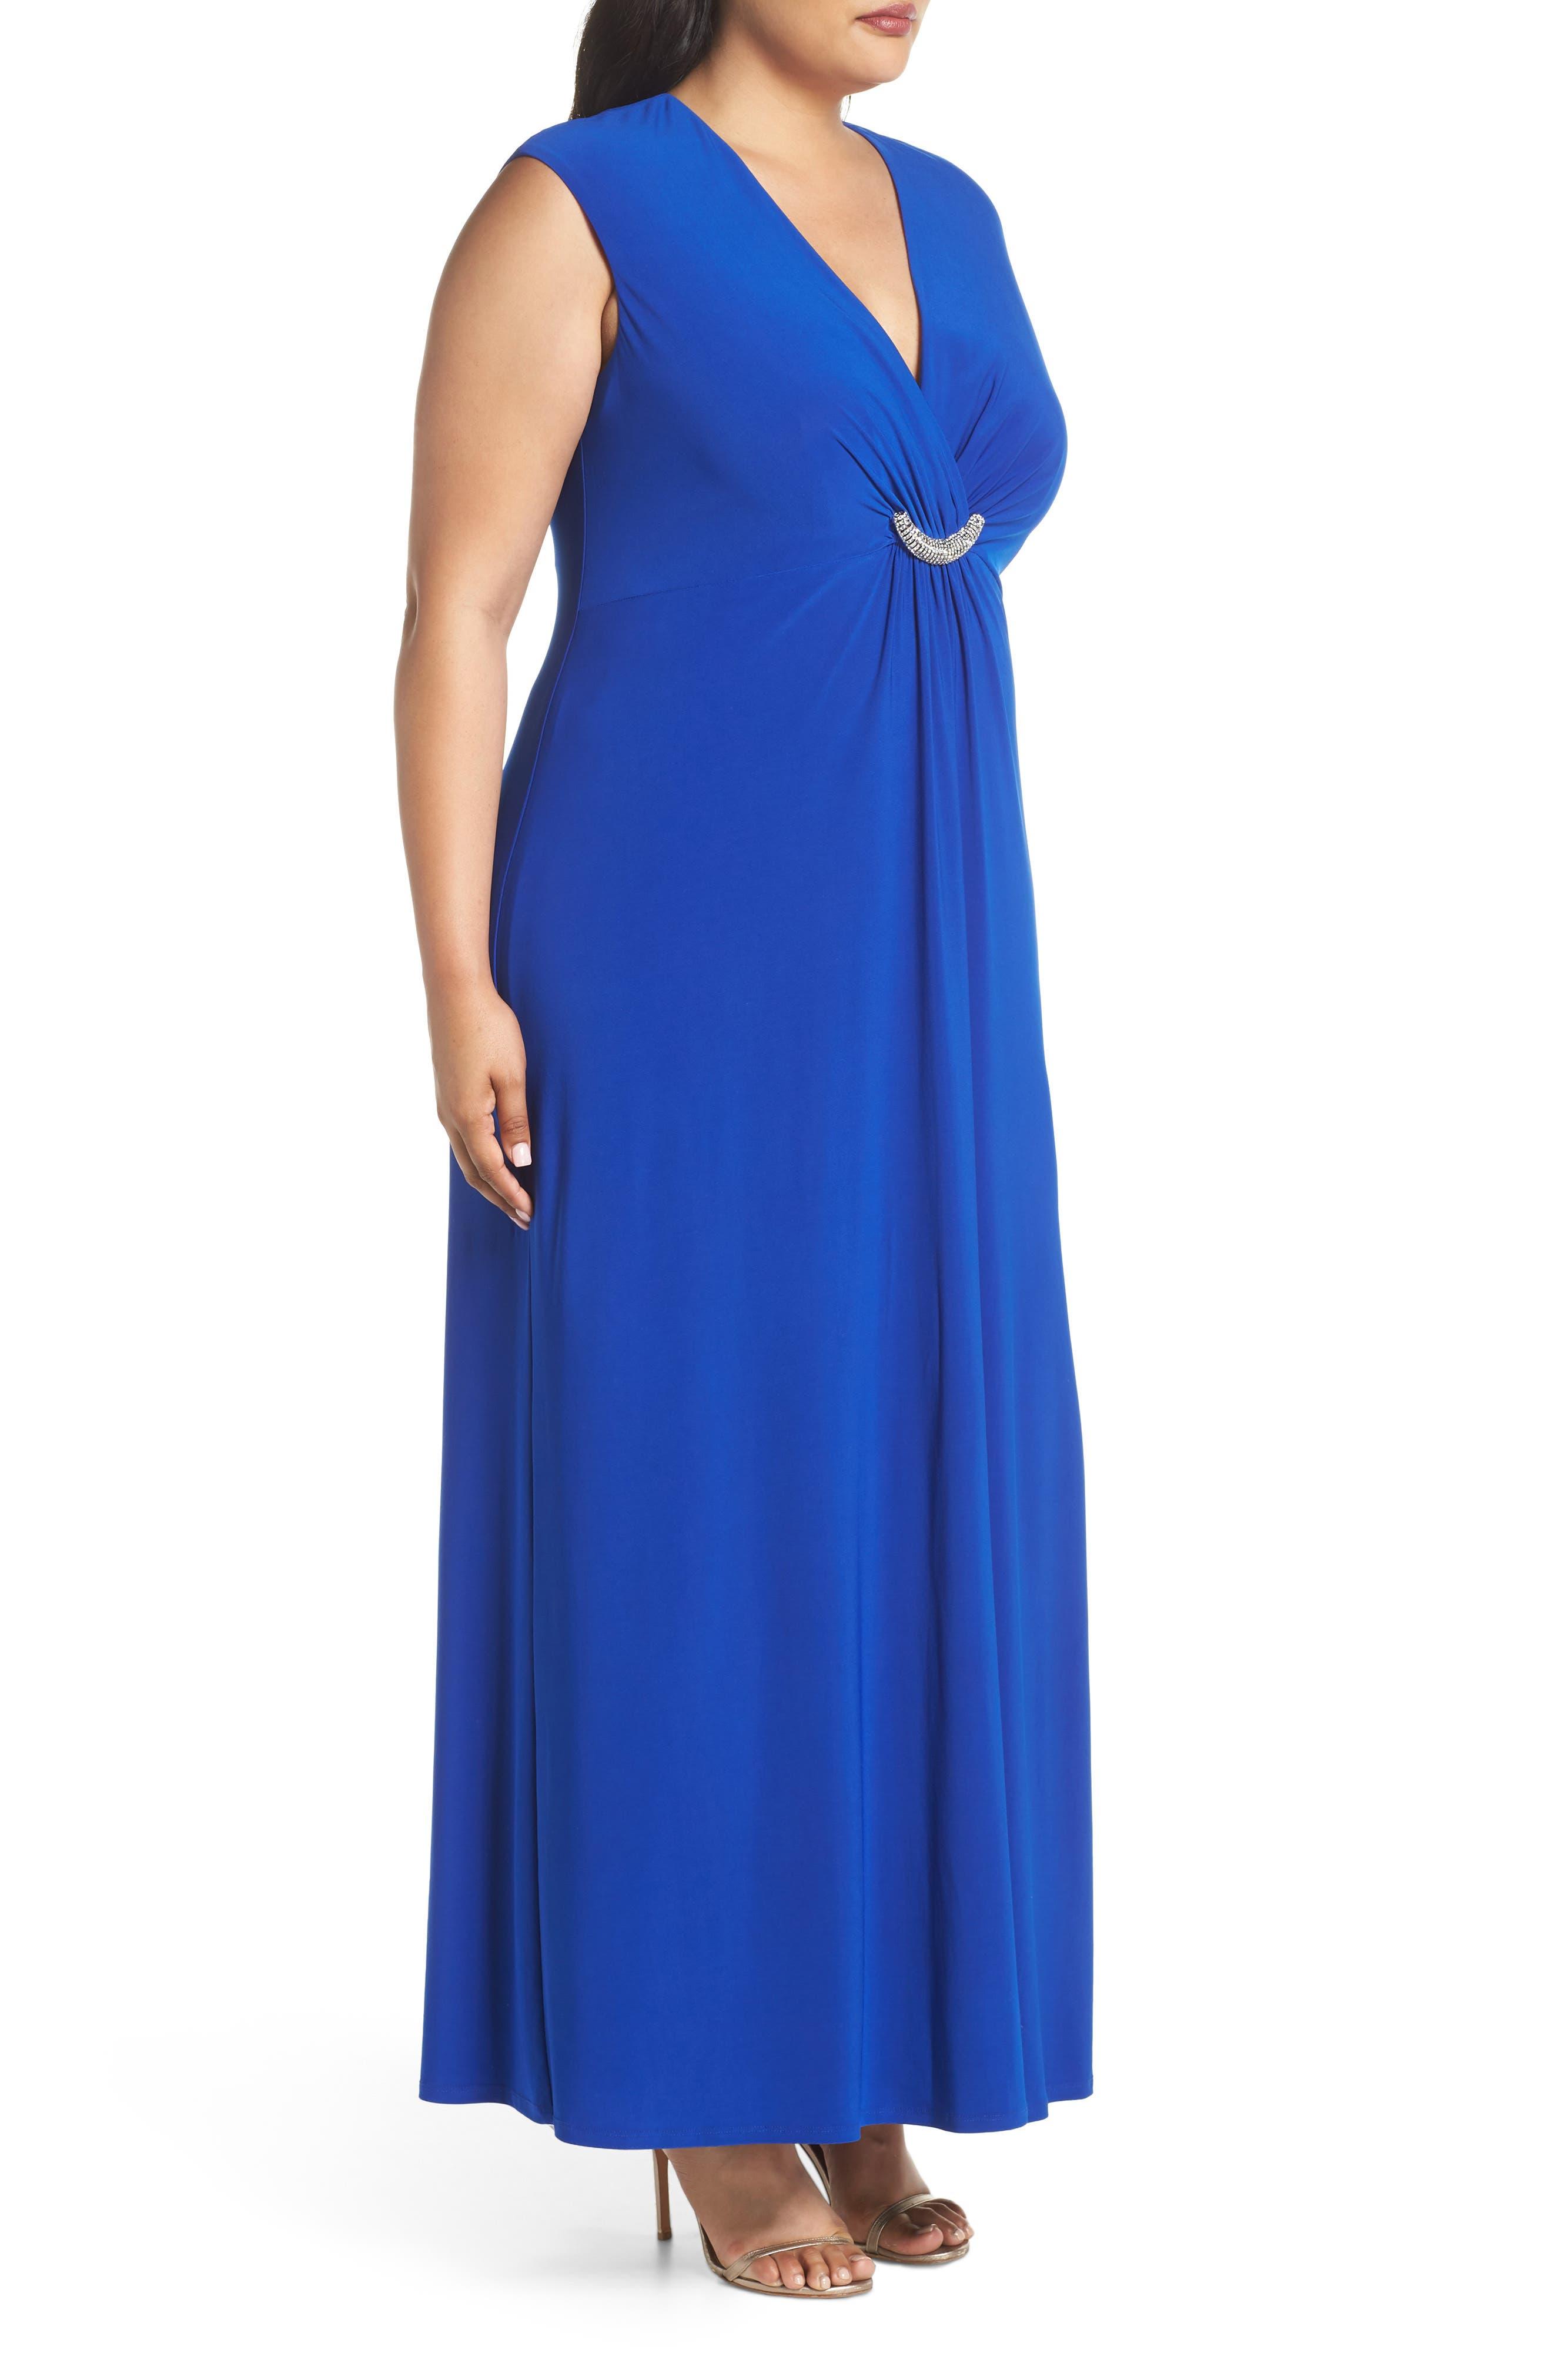 Embellished Surplice Dress,                             Alternate thumbnail 3, color,                             430